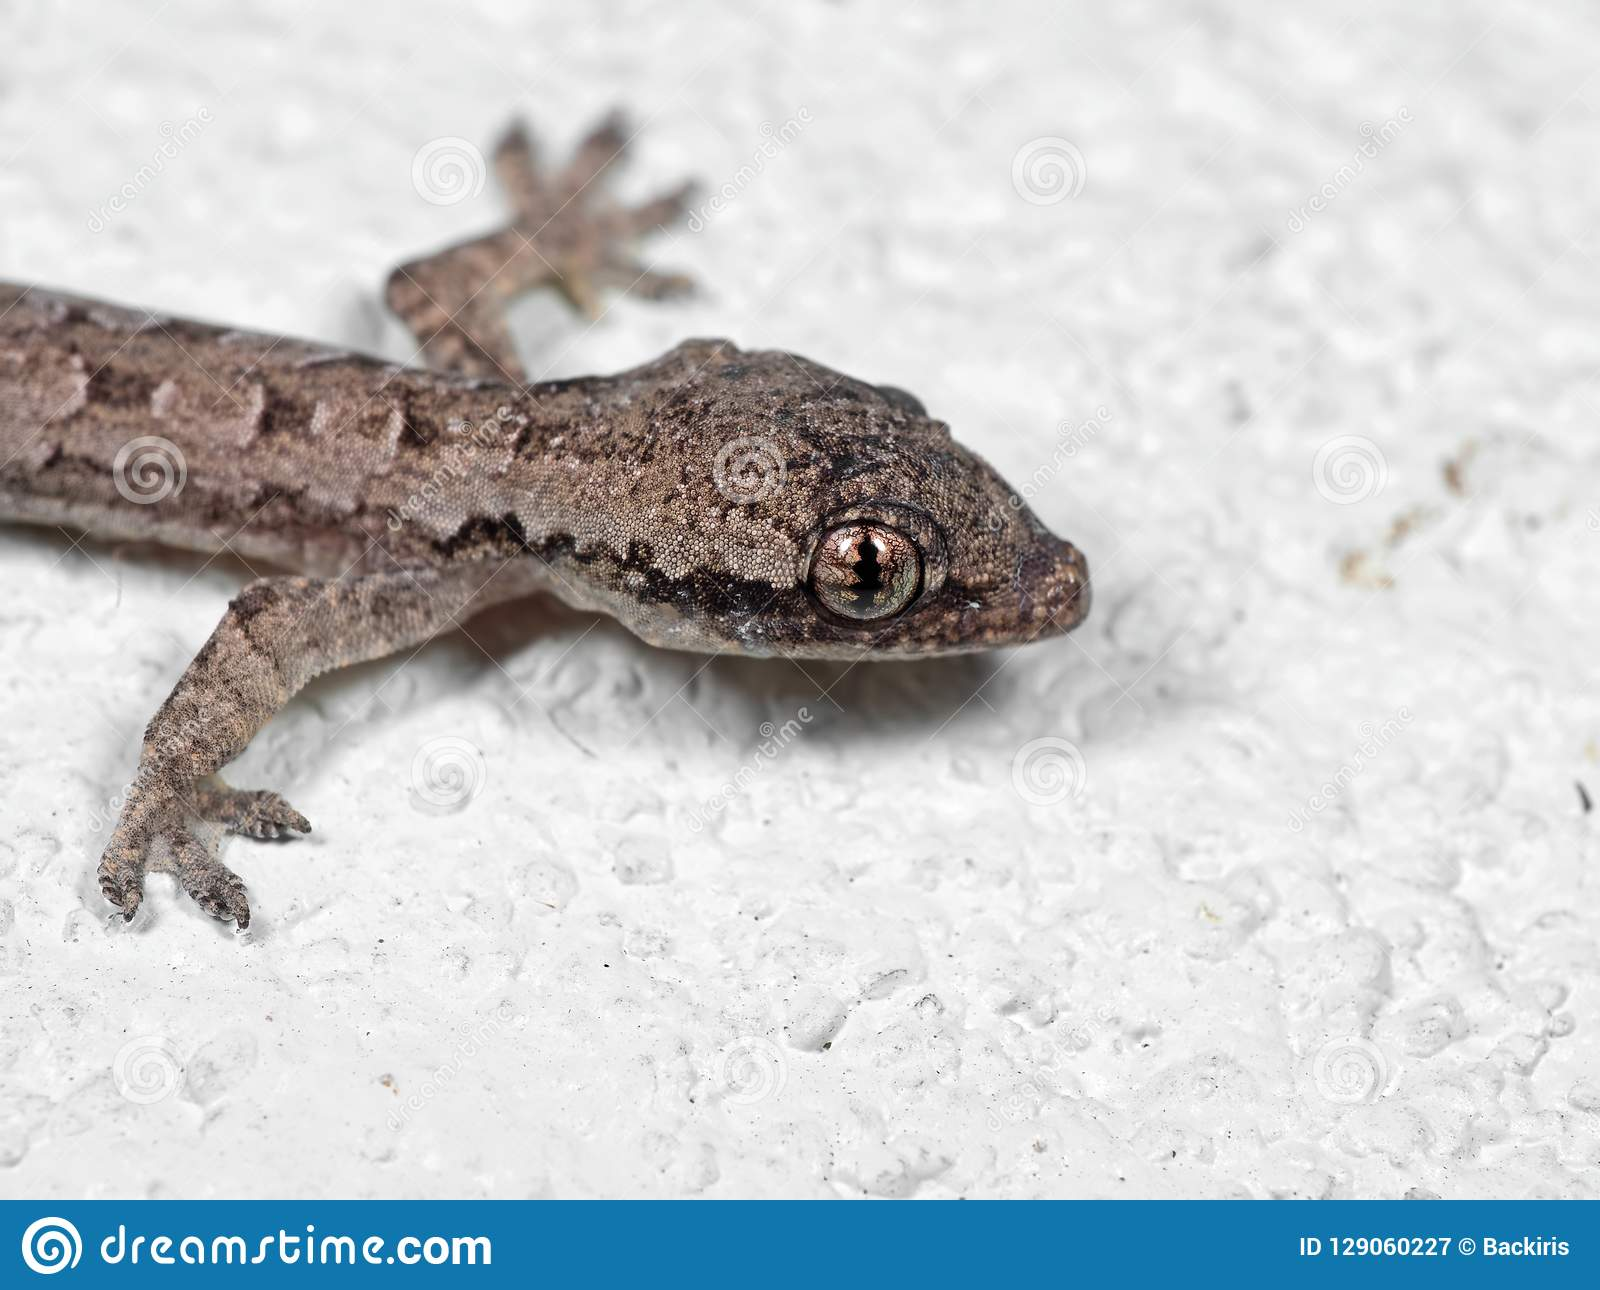 Macro Photo Of Mediterranean House Gecko On White Floor Stock Image